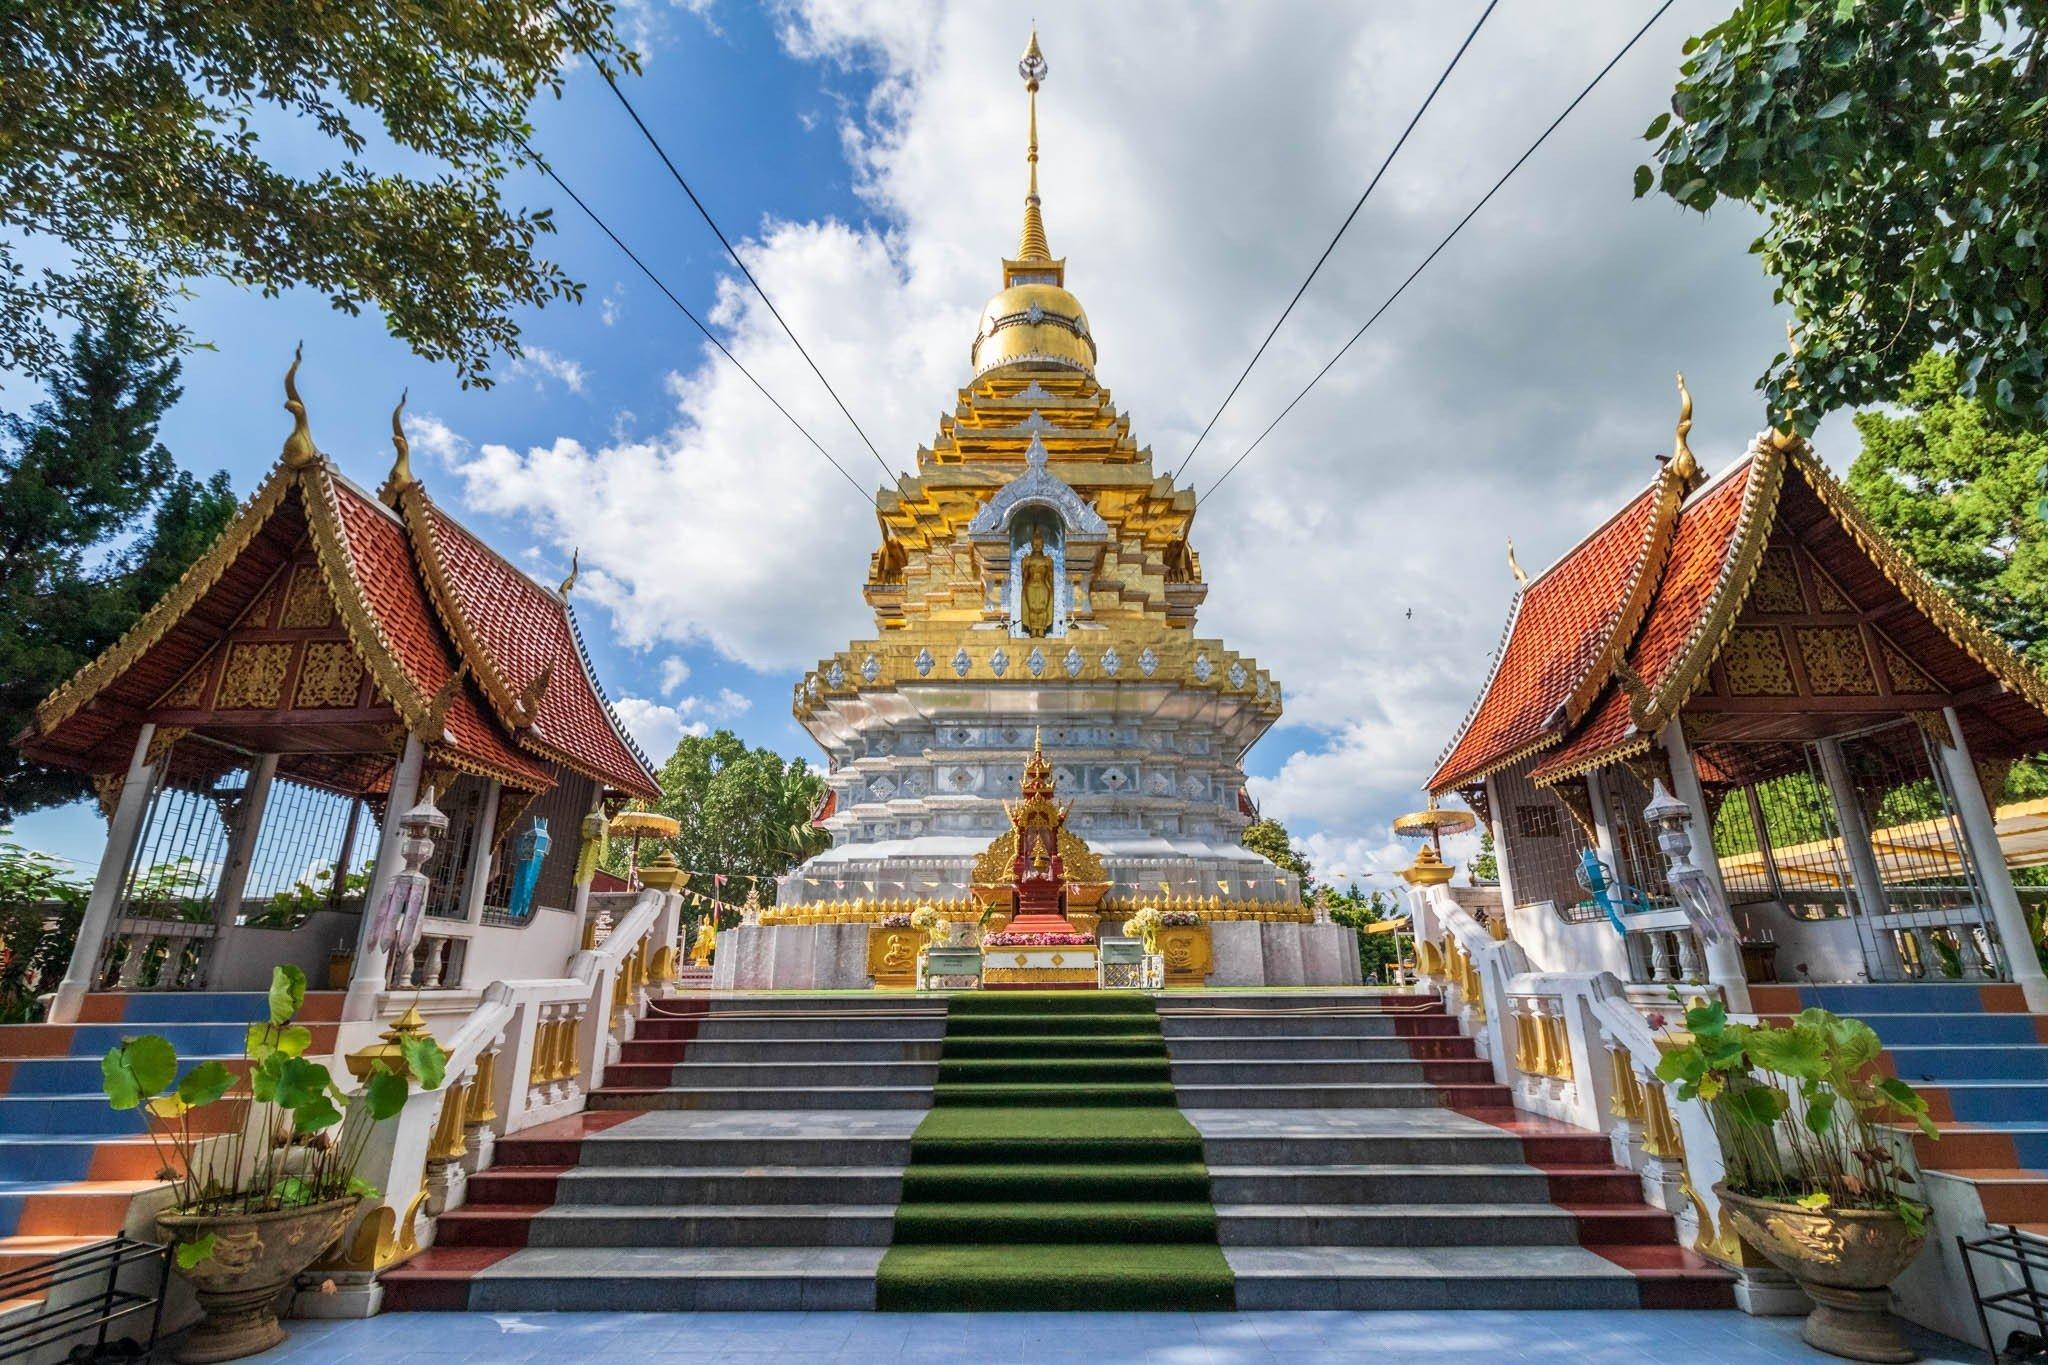 Wat Phra That Doi Saket - Choeng Doi, Doi Saket